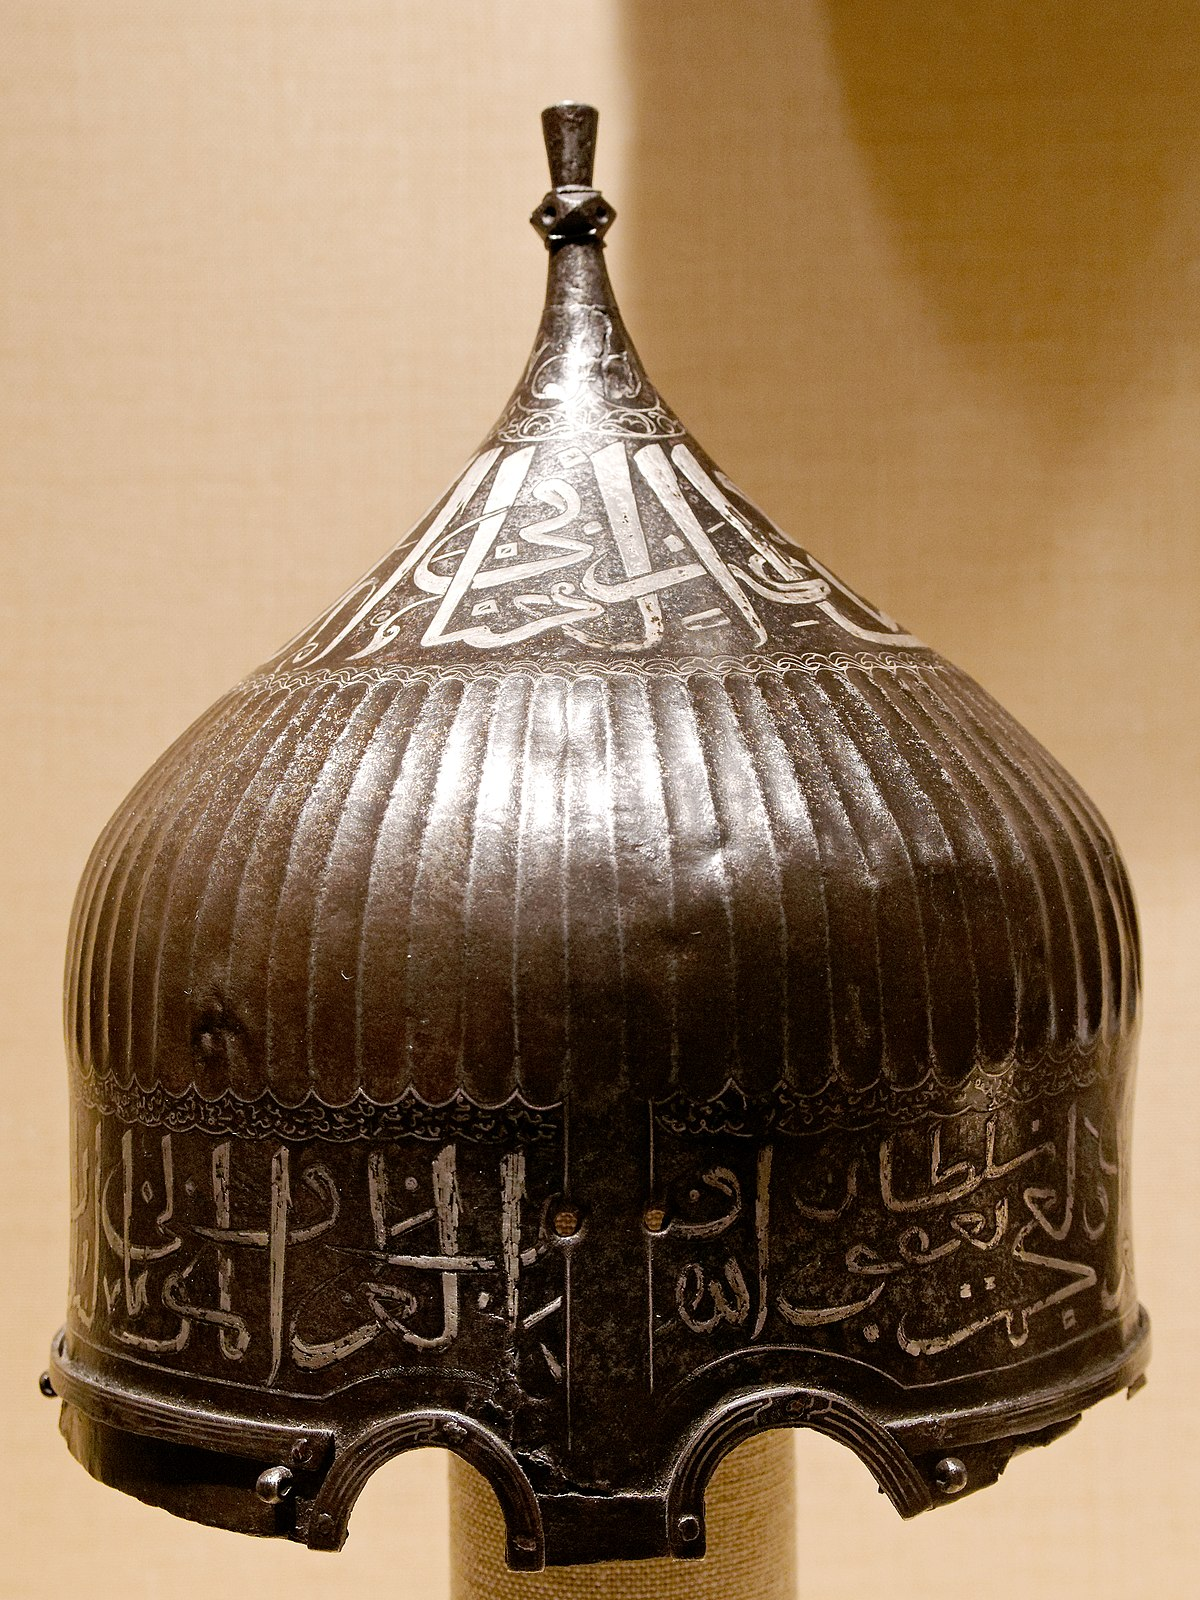 Sahib - Wikipedia